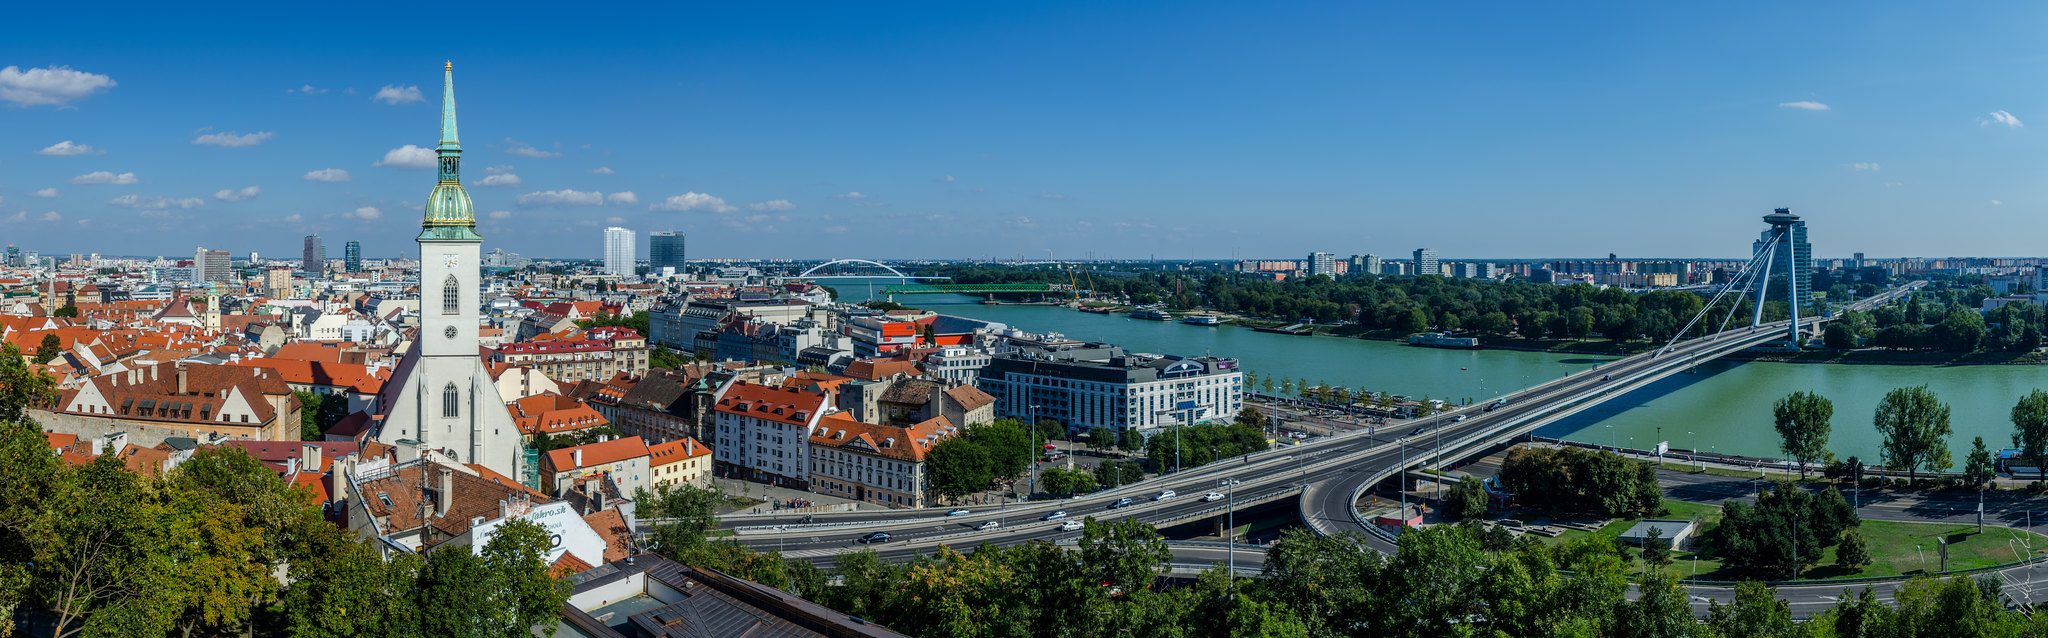 PragueVienneBudapest-Flickr-18